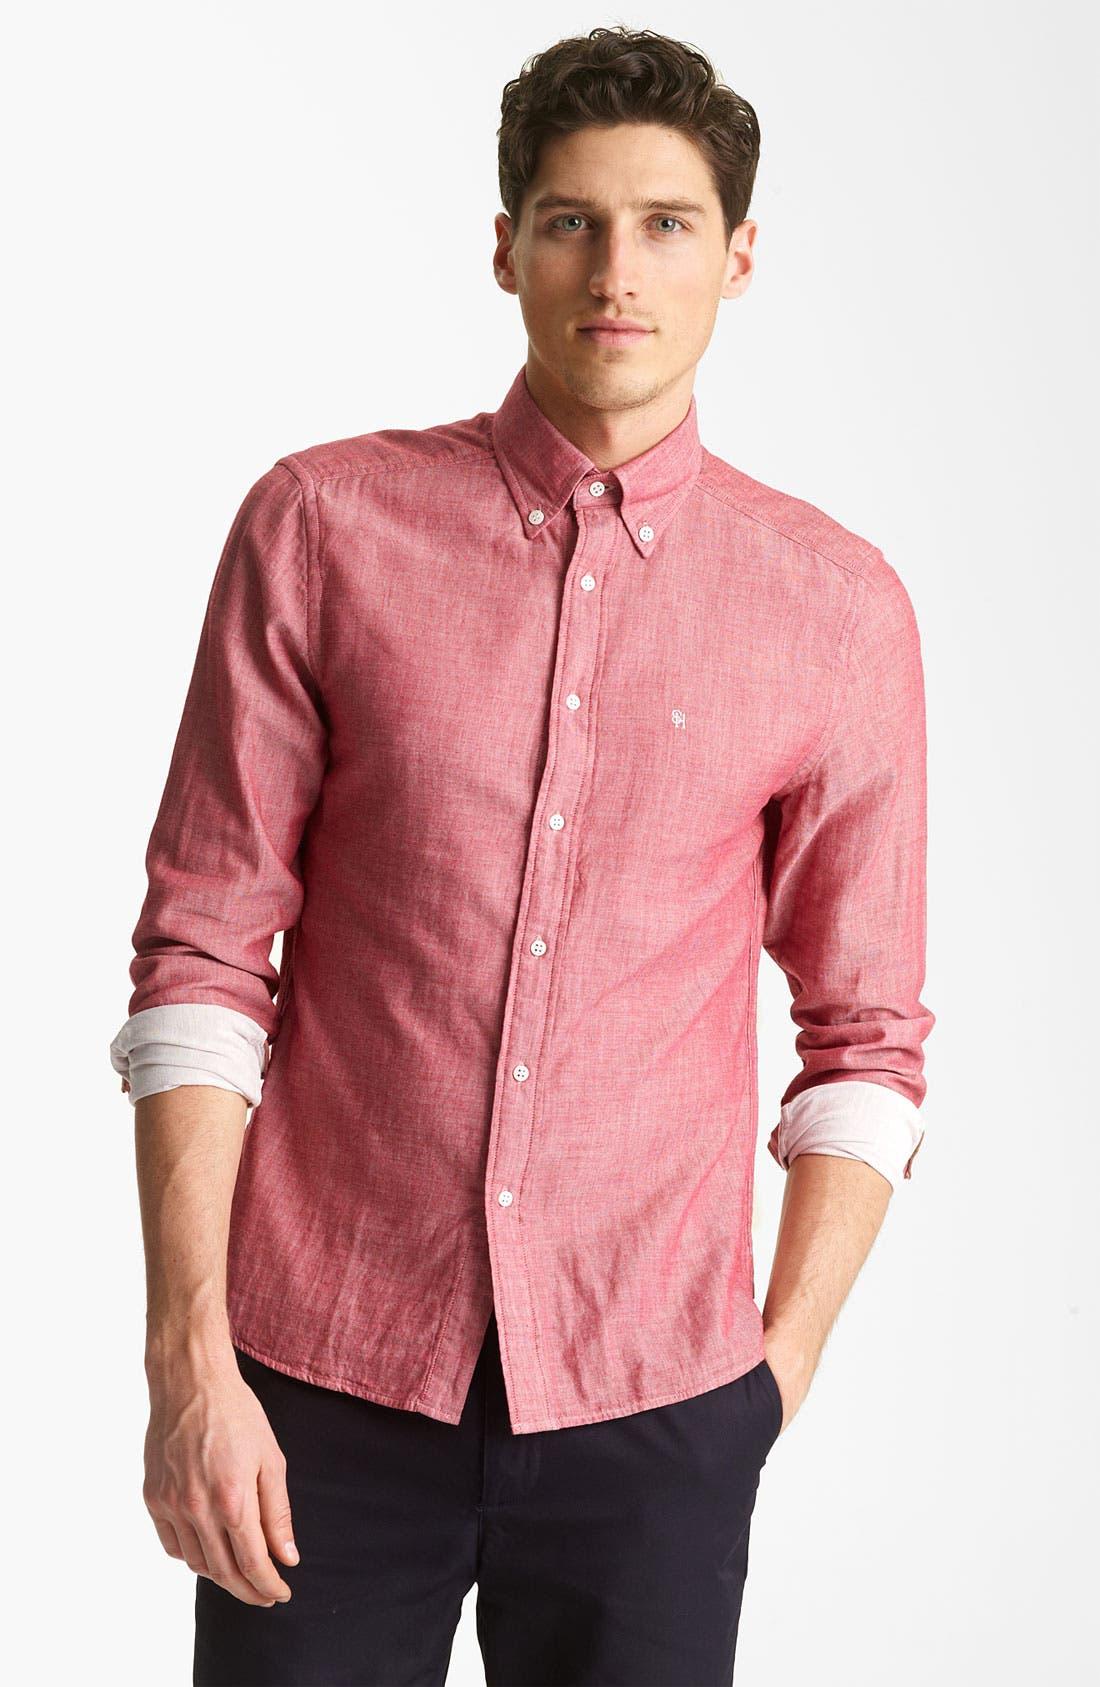 Alternate Image 1 Selected - Shipley & Halmos 'Booster' Chambray Shirt